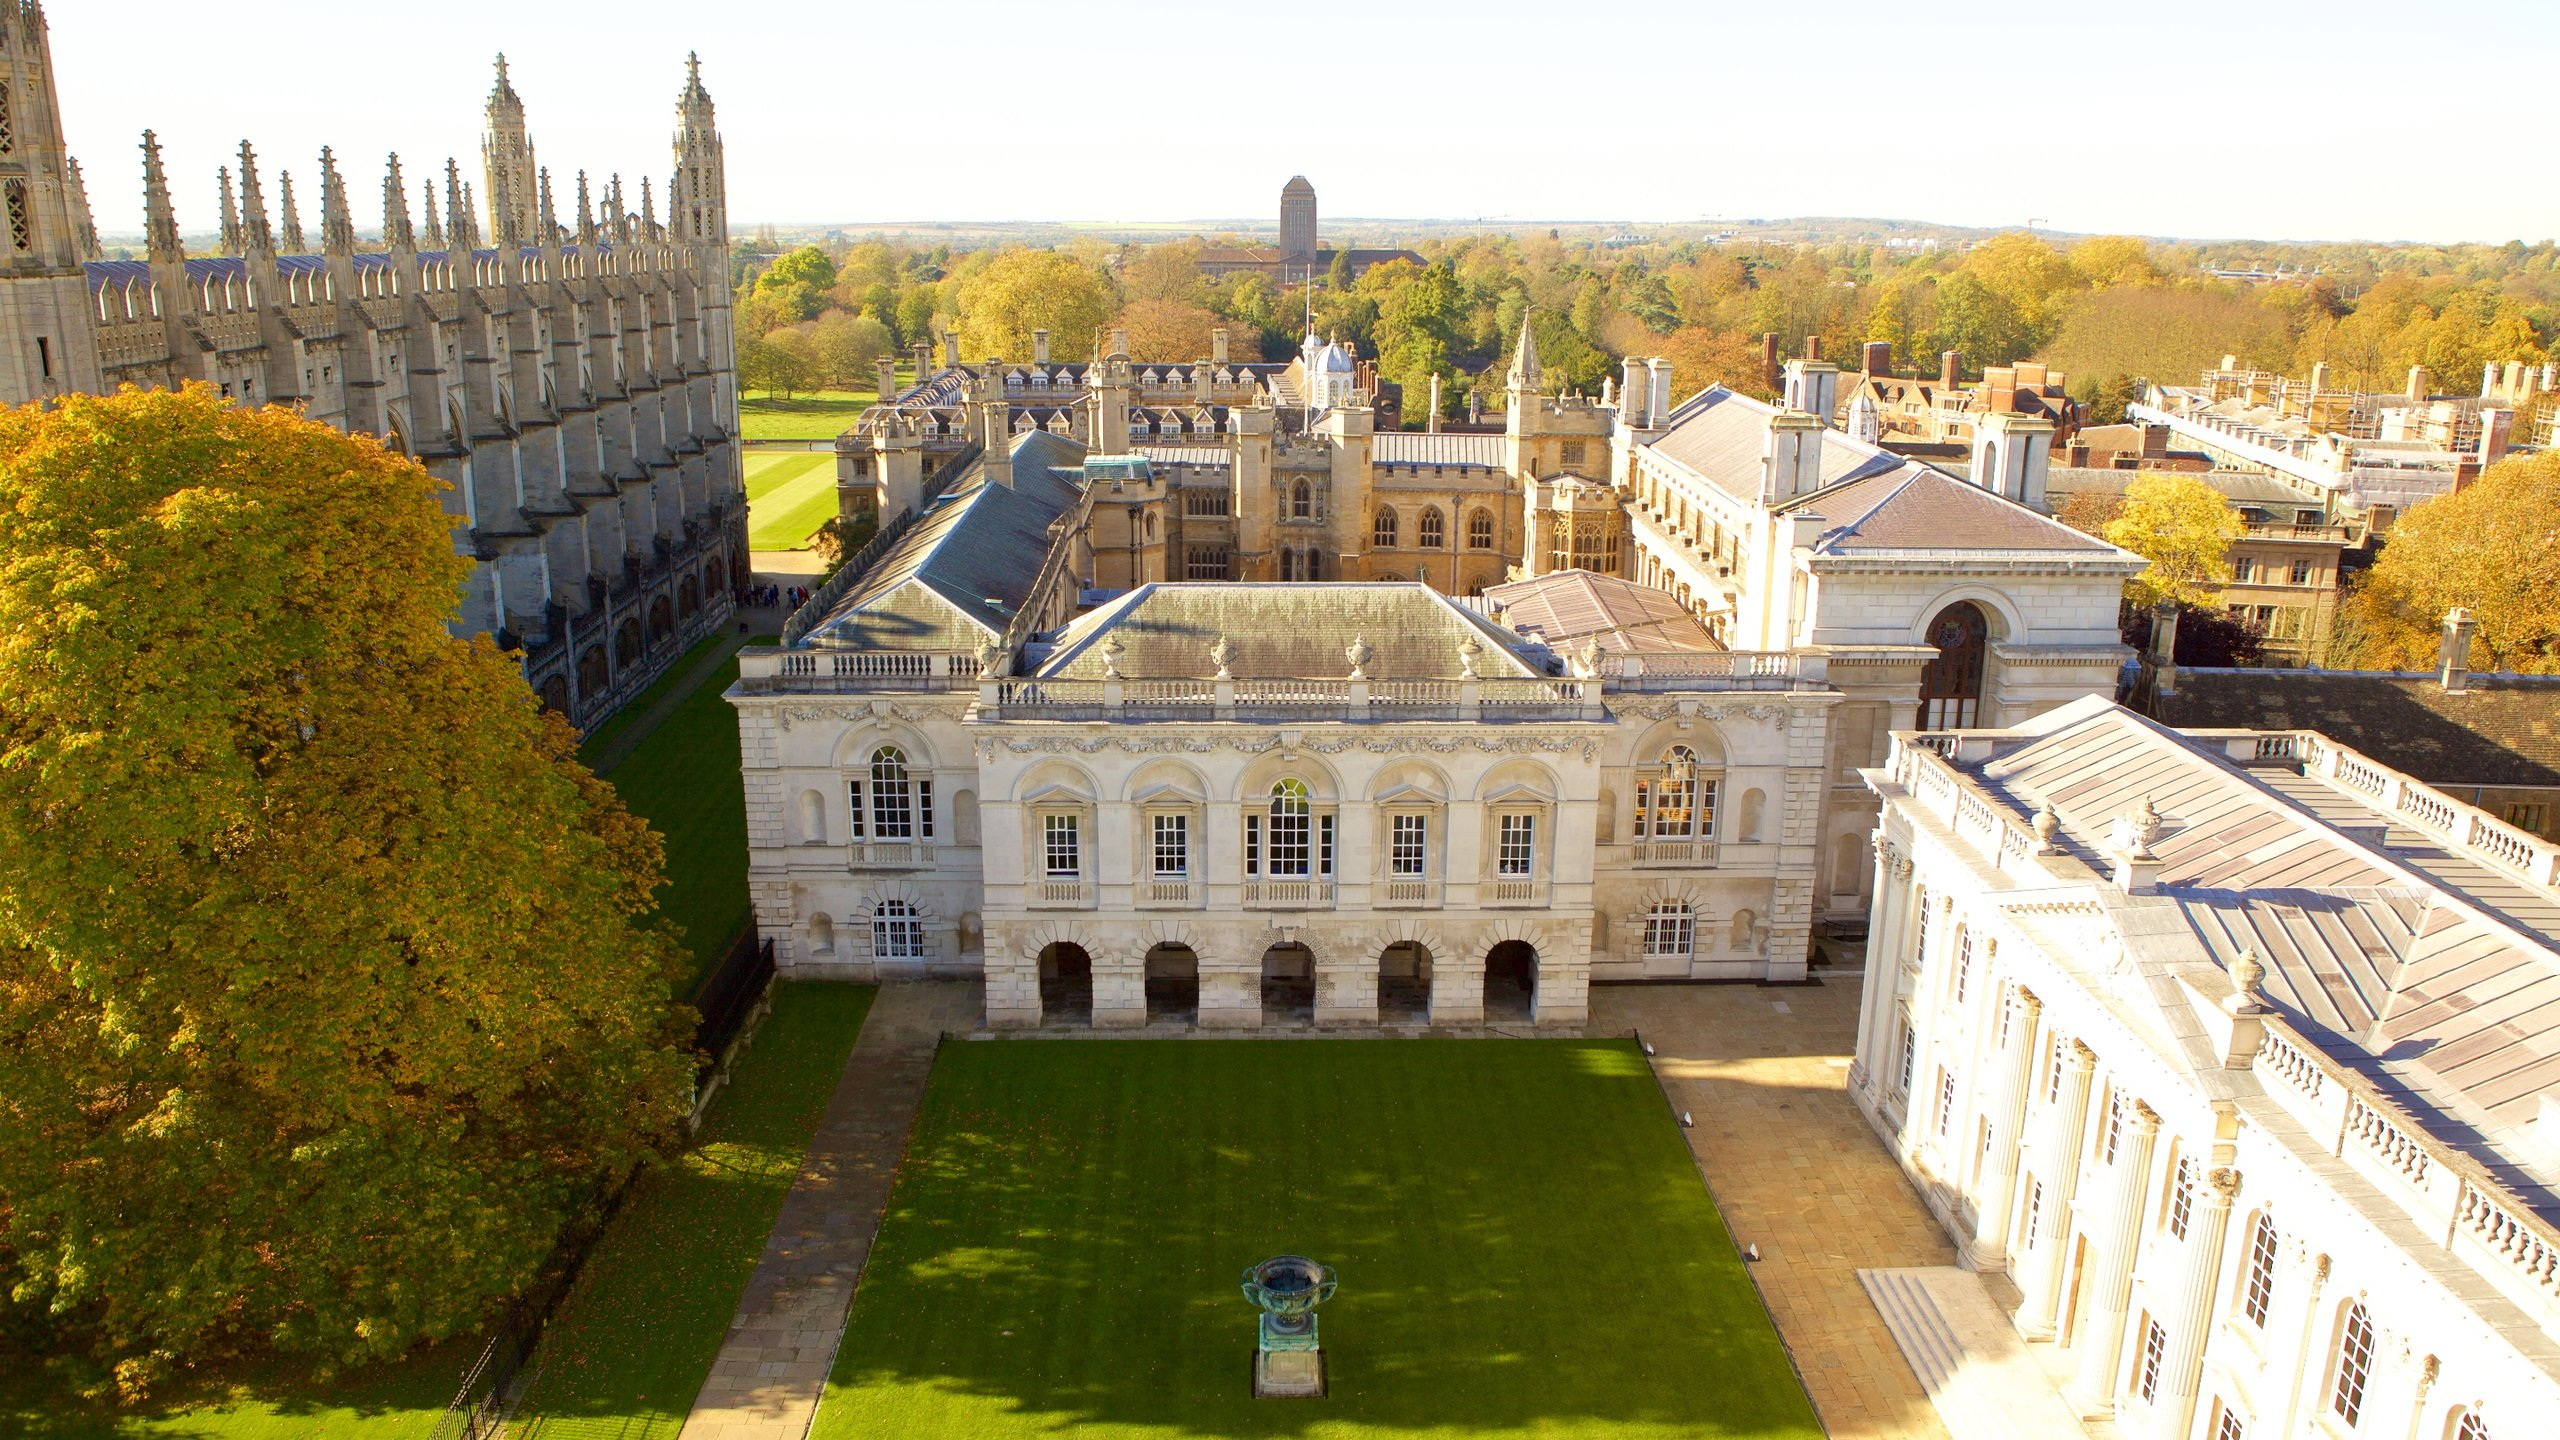 Senate House, Cambridge, England, Storbritannien